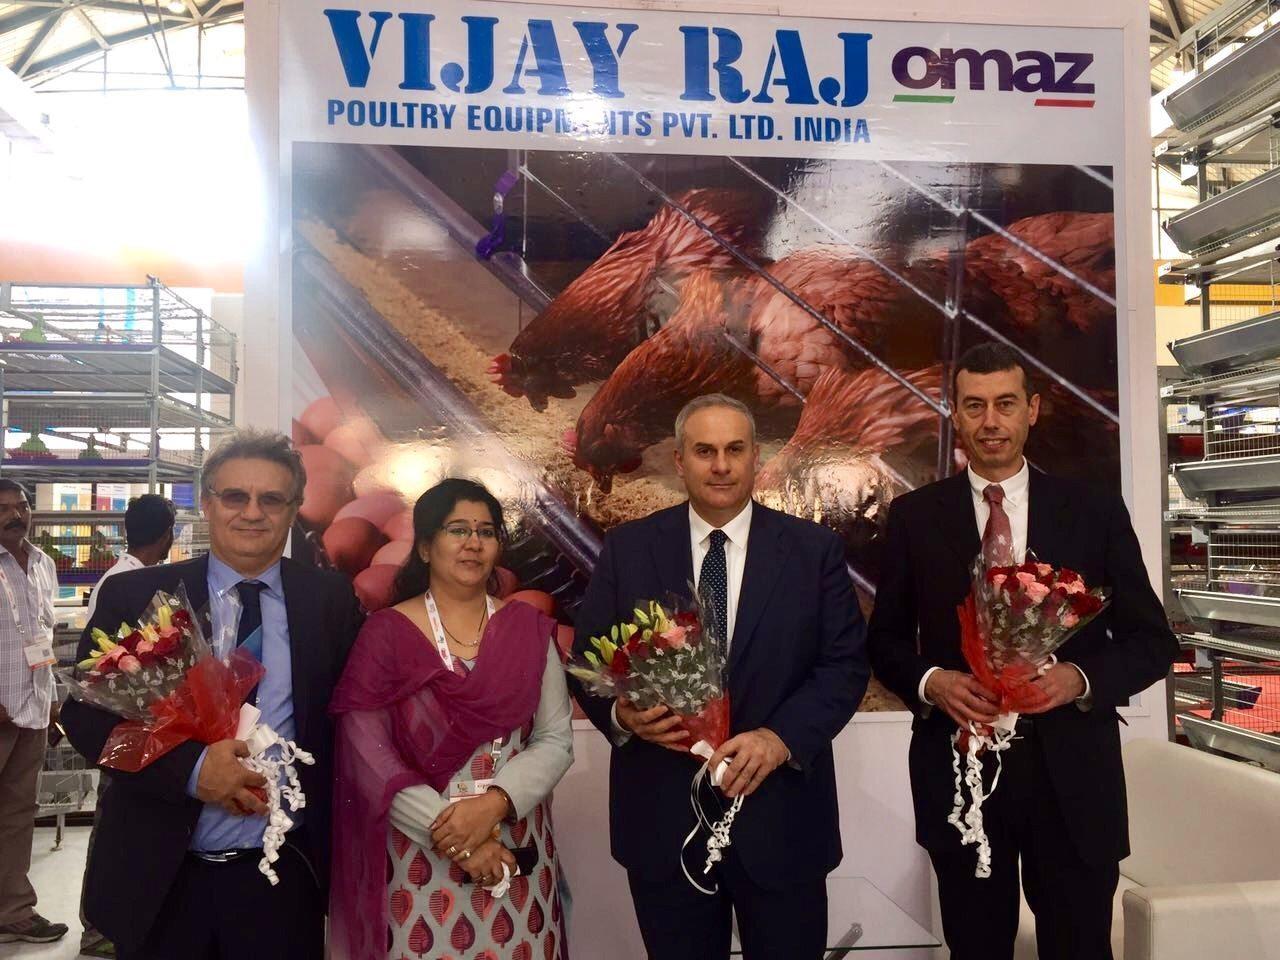 OMAZ at Poultry India 2016 – OMAZ Srl